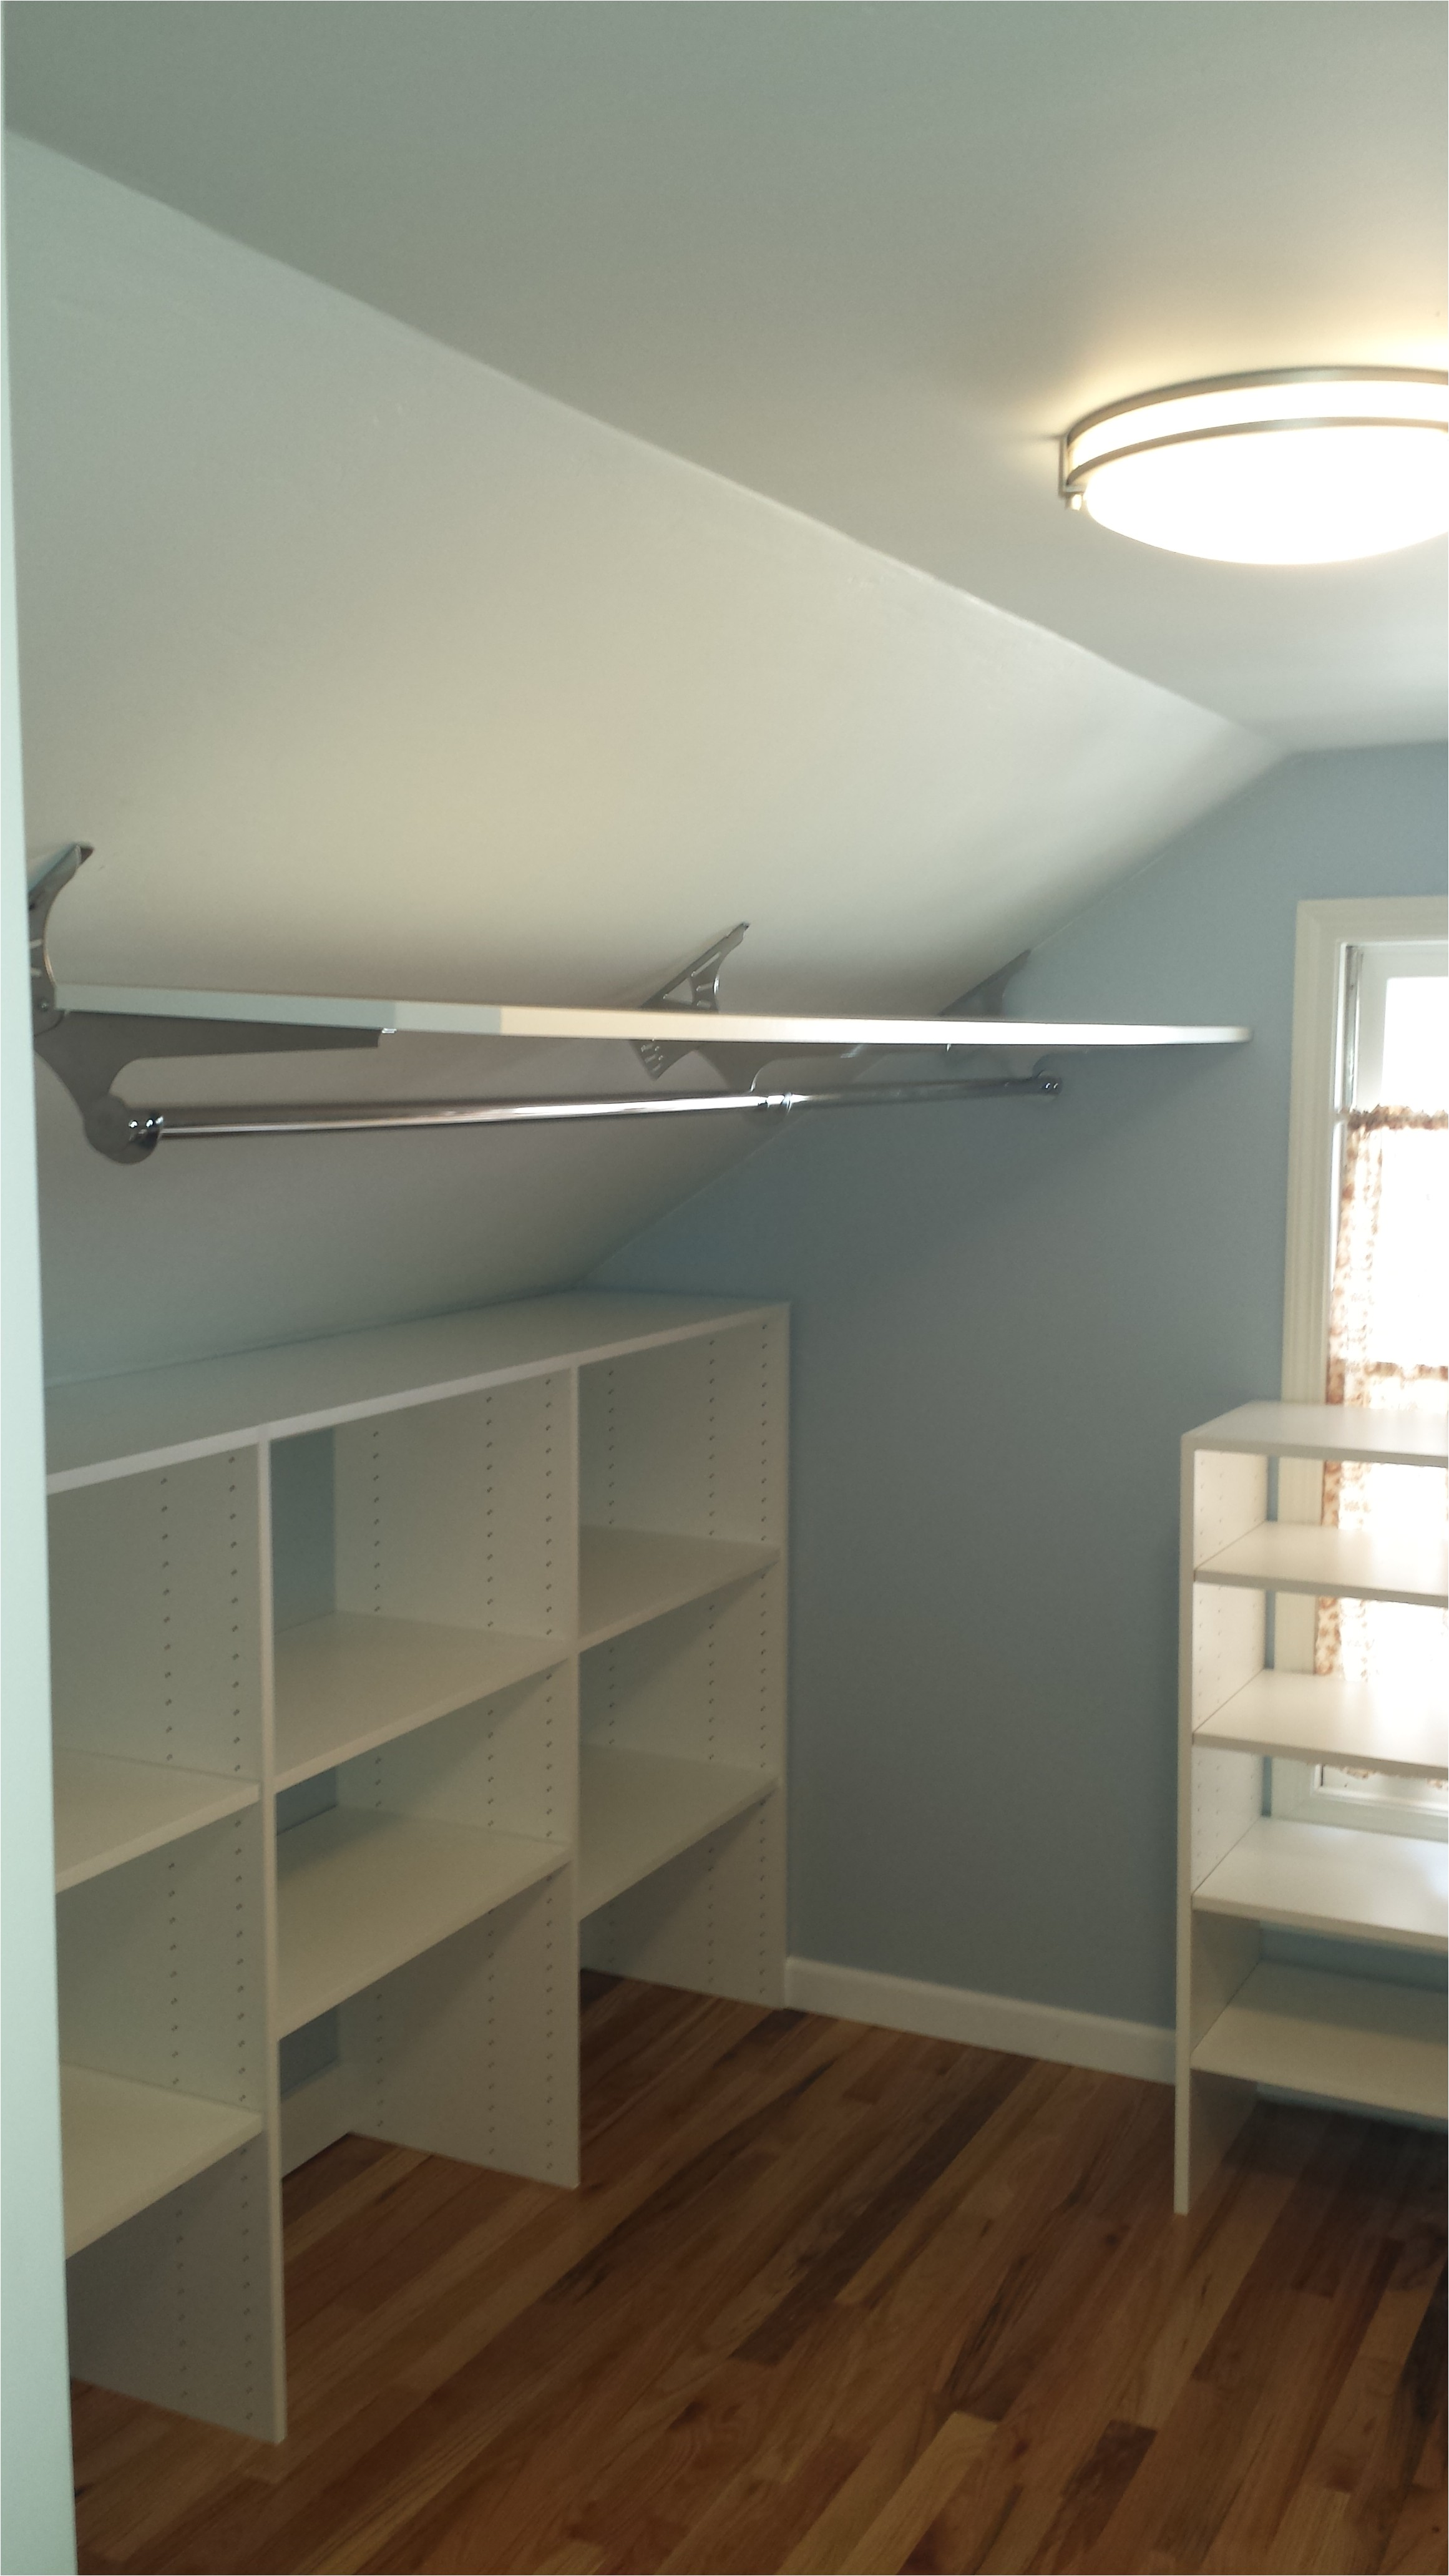 5695 closet rod bracket for sloped ceiling